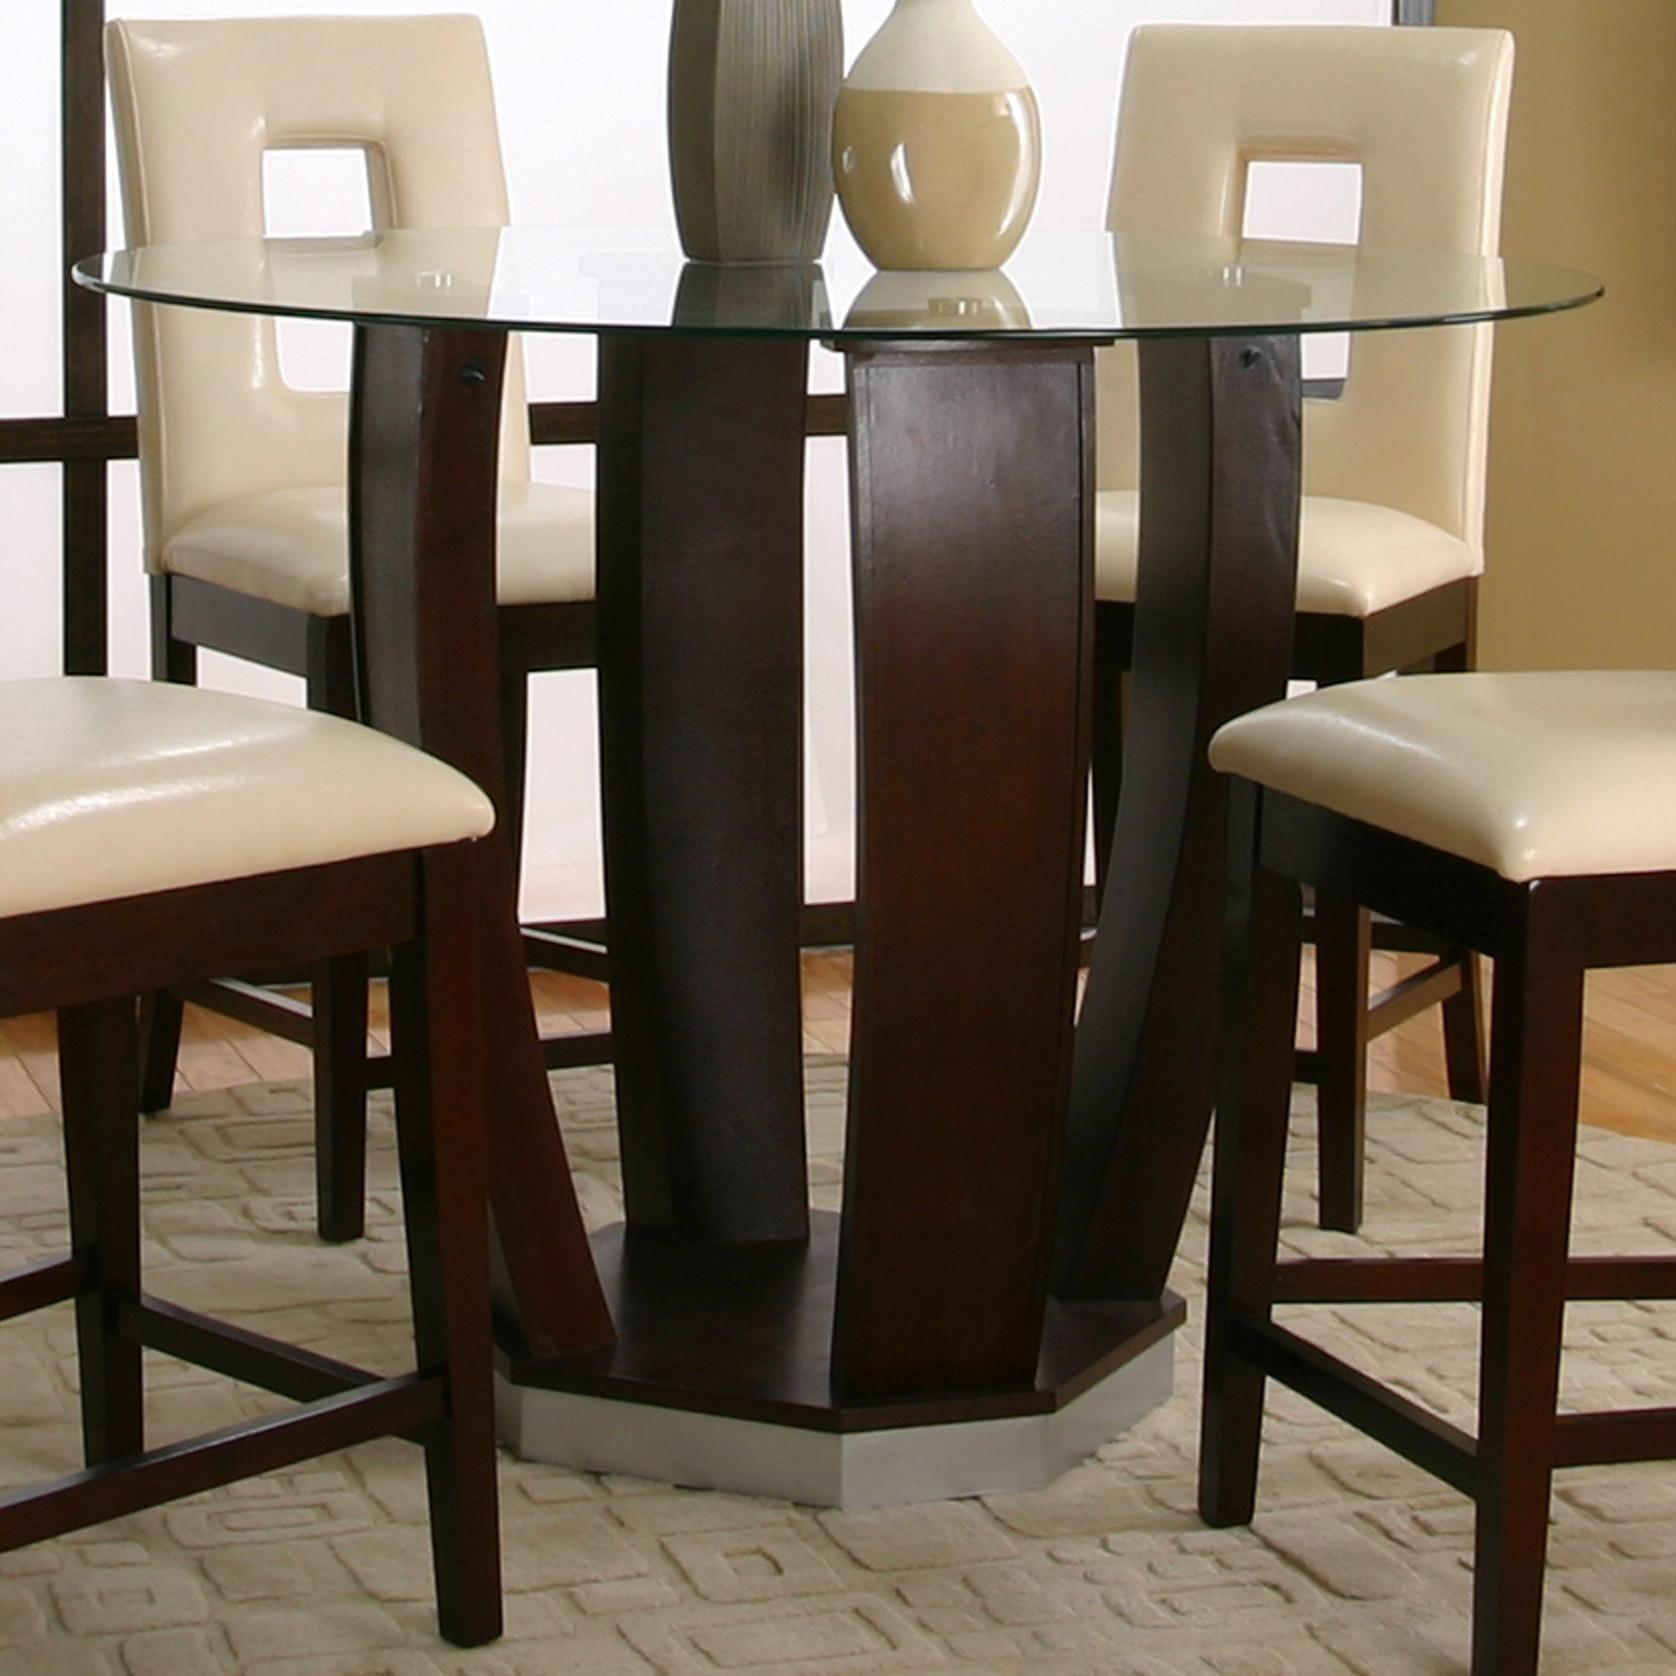 Dining Room Sets Columbus Ohio: Emerson Round Tempered Glass Pub